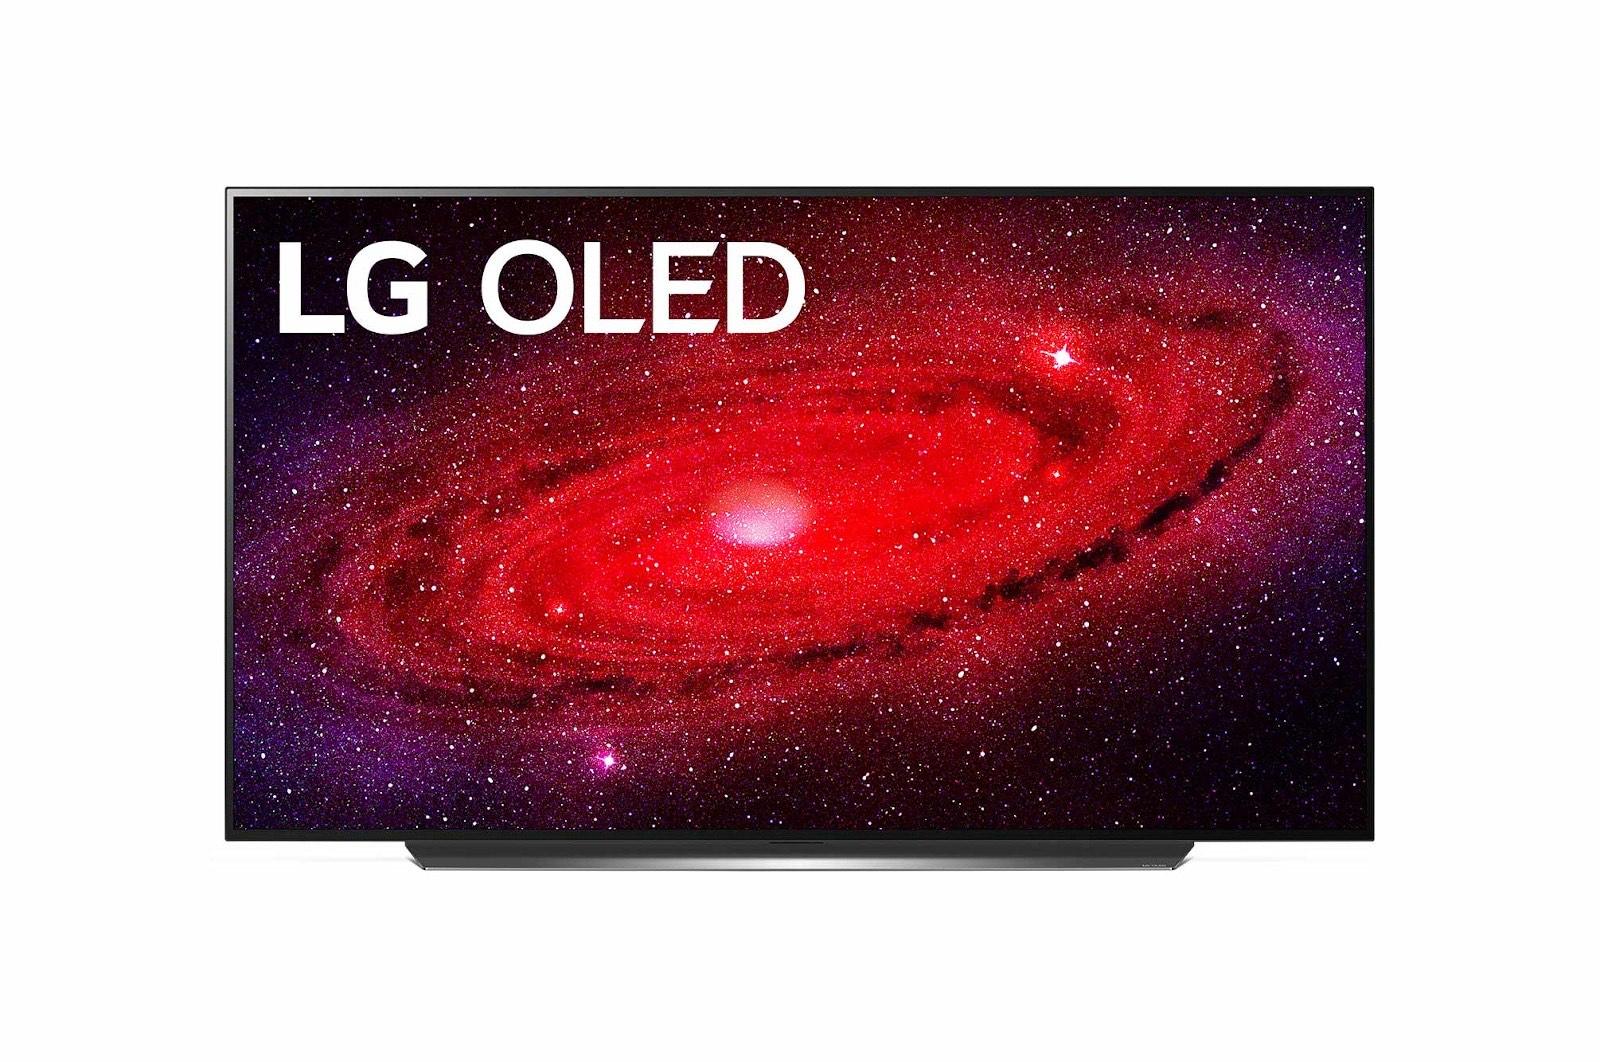 LG OLED48CX5LC 48 Inch 4K OLED TV - 5 Years Warranty + Free LG HBSFN4 Wireless Earbuds £1,093 @ RGB Direct